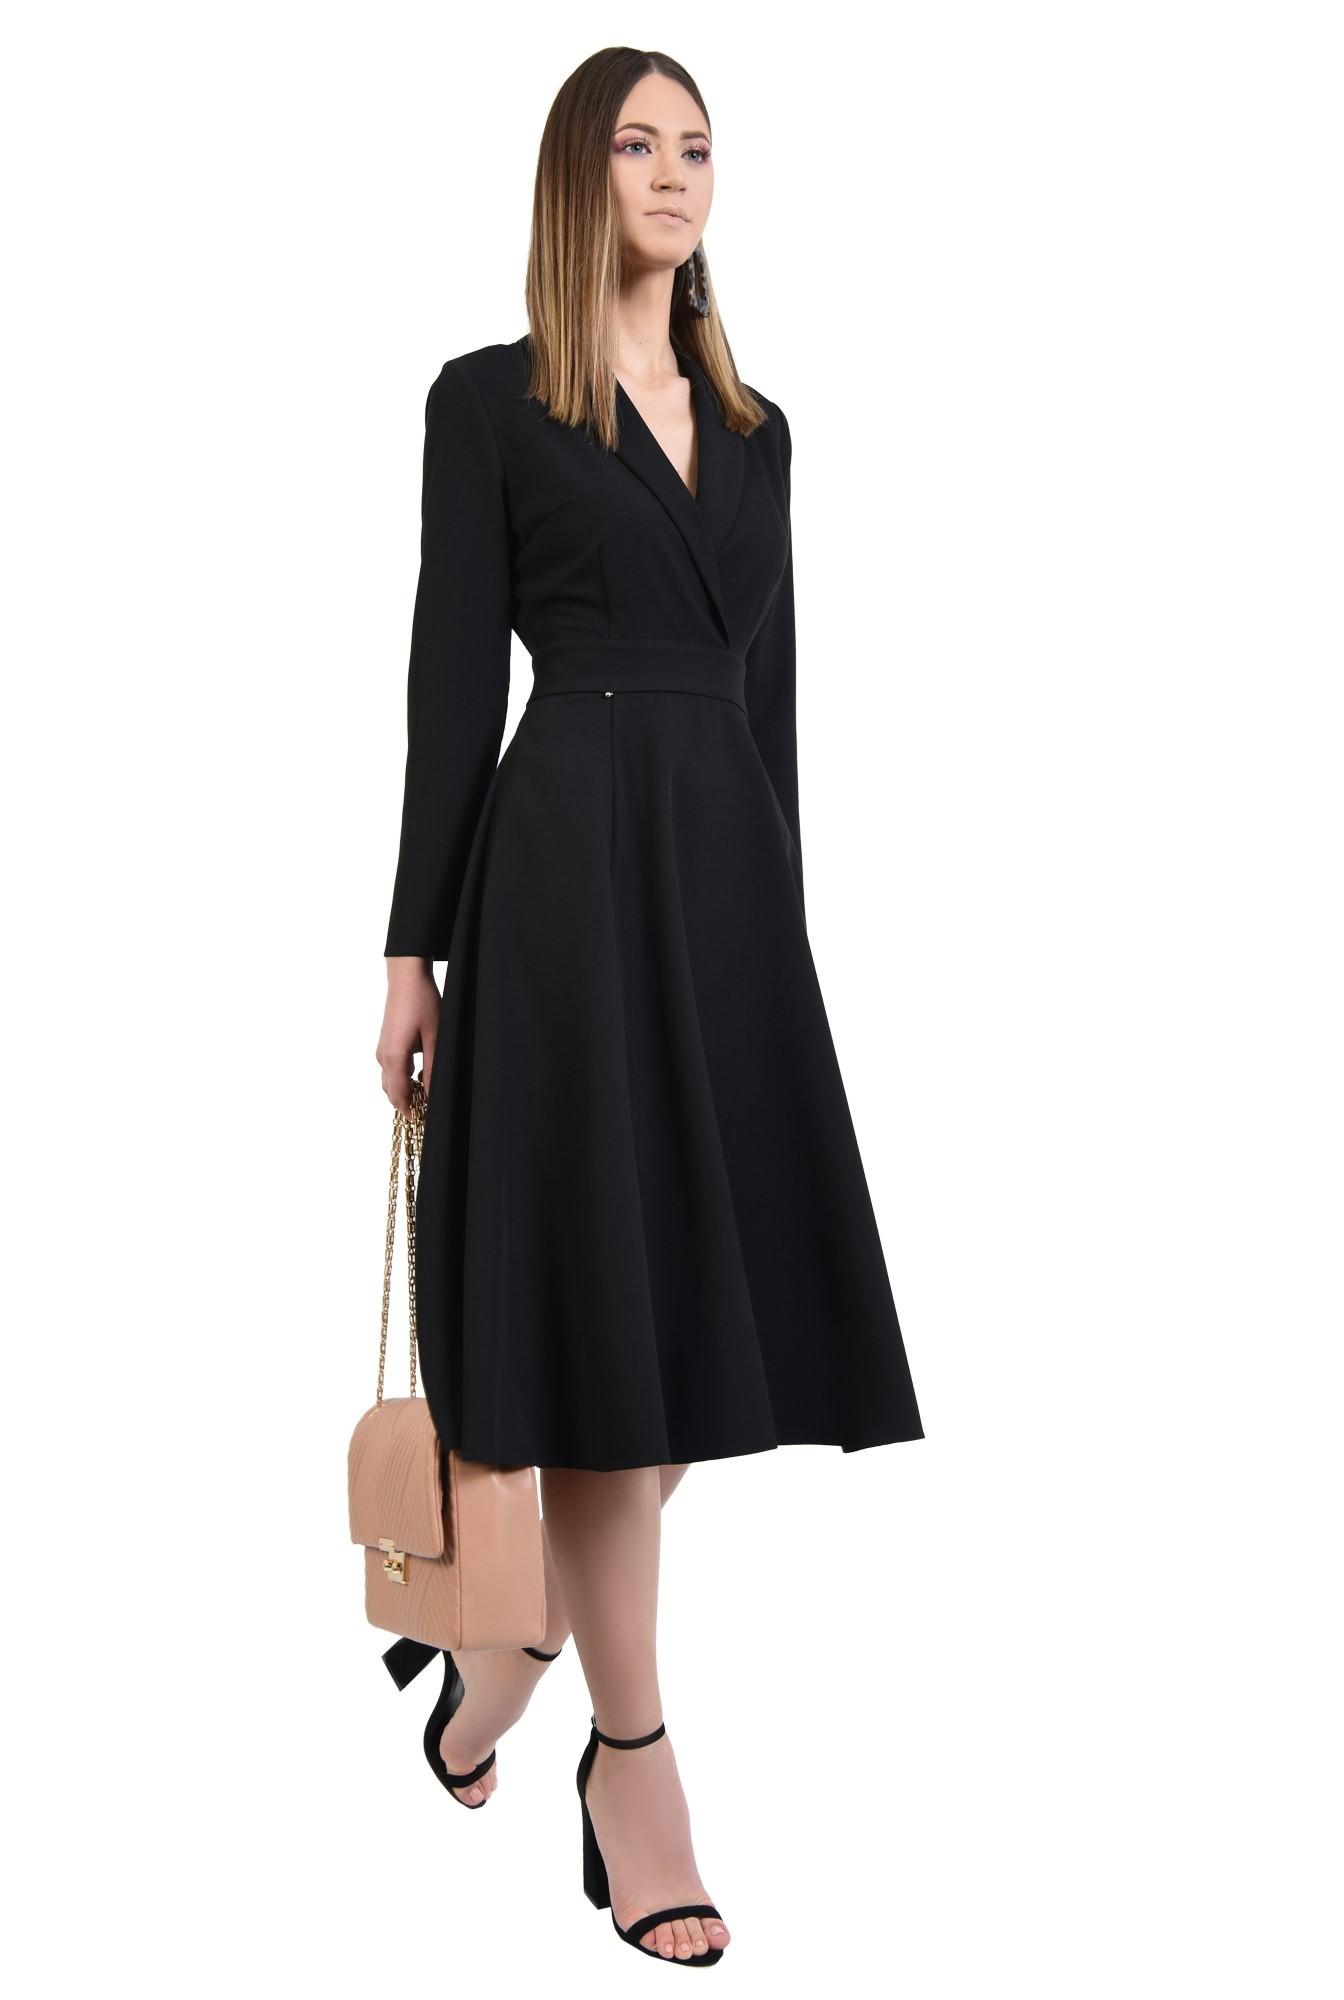 rochie neagra, evazata, midi, talie cu betelie, maneci ajustate